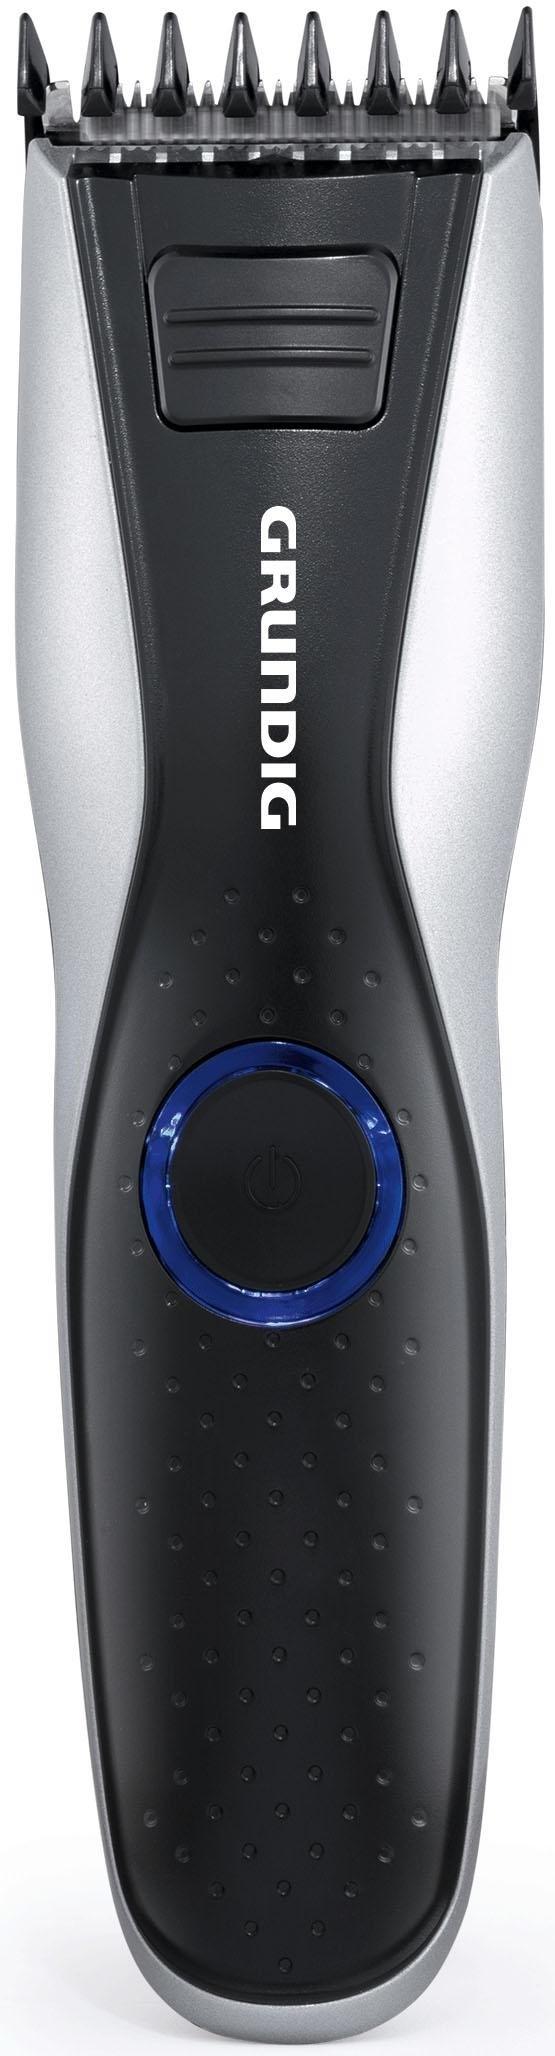 Grundig tondeuse MC 6840 veilig op otto.nl kopen